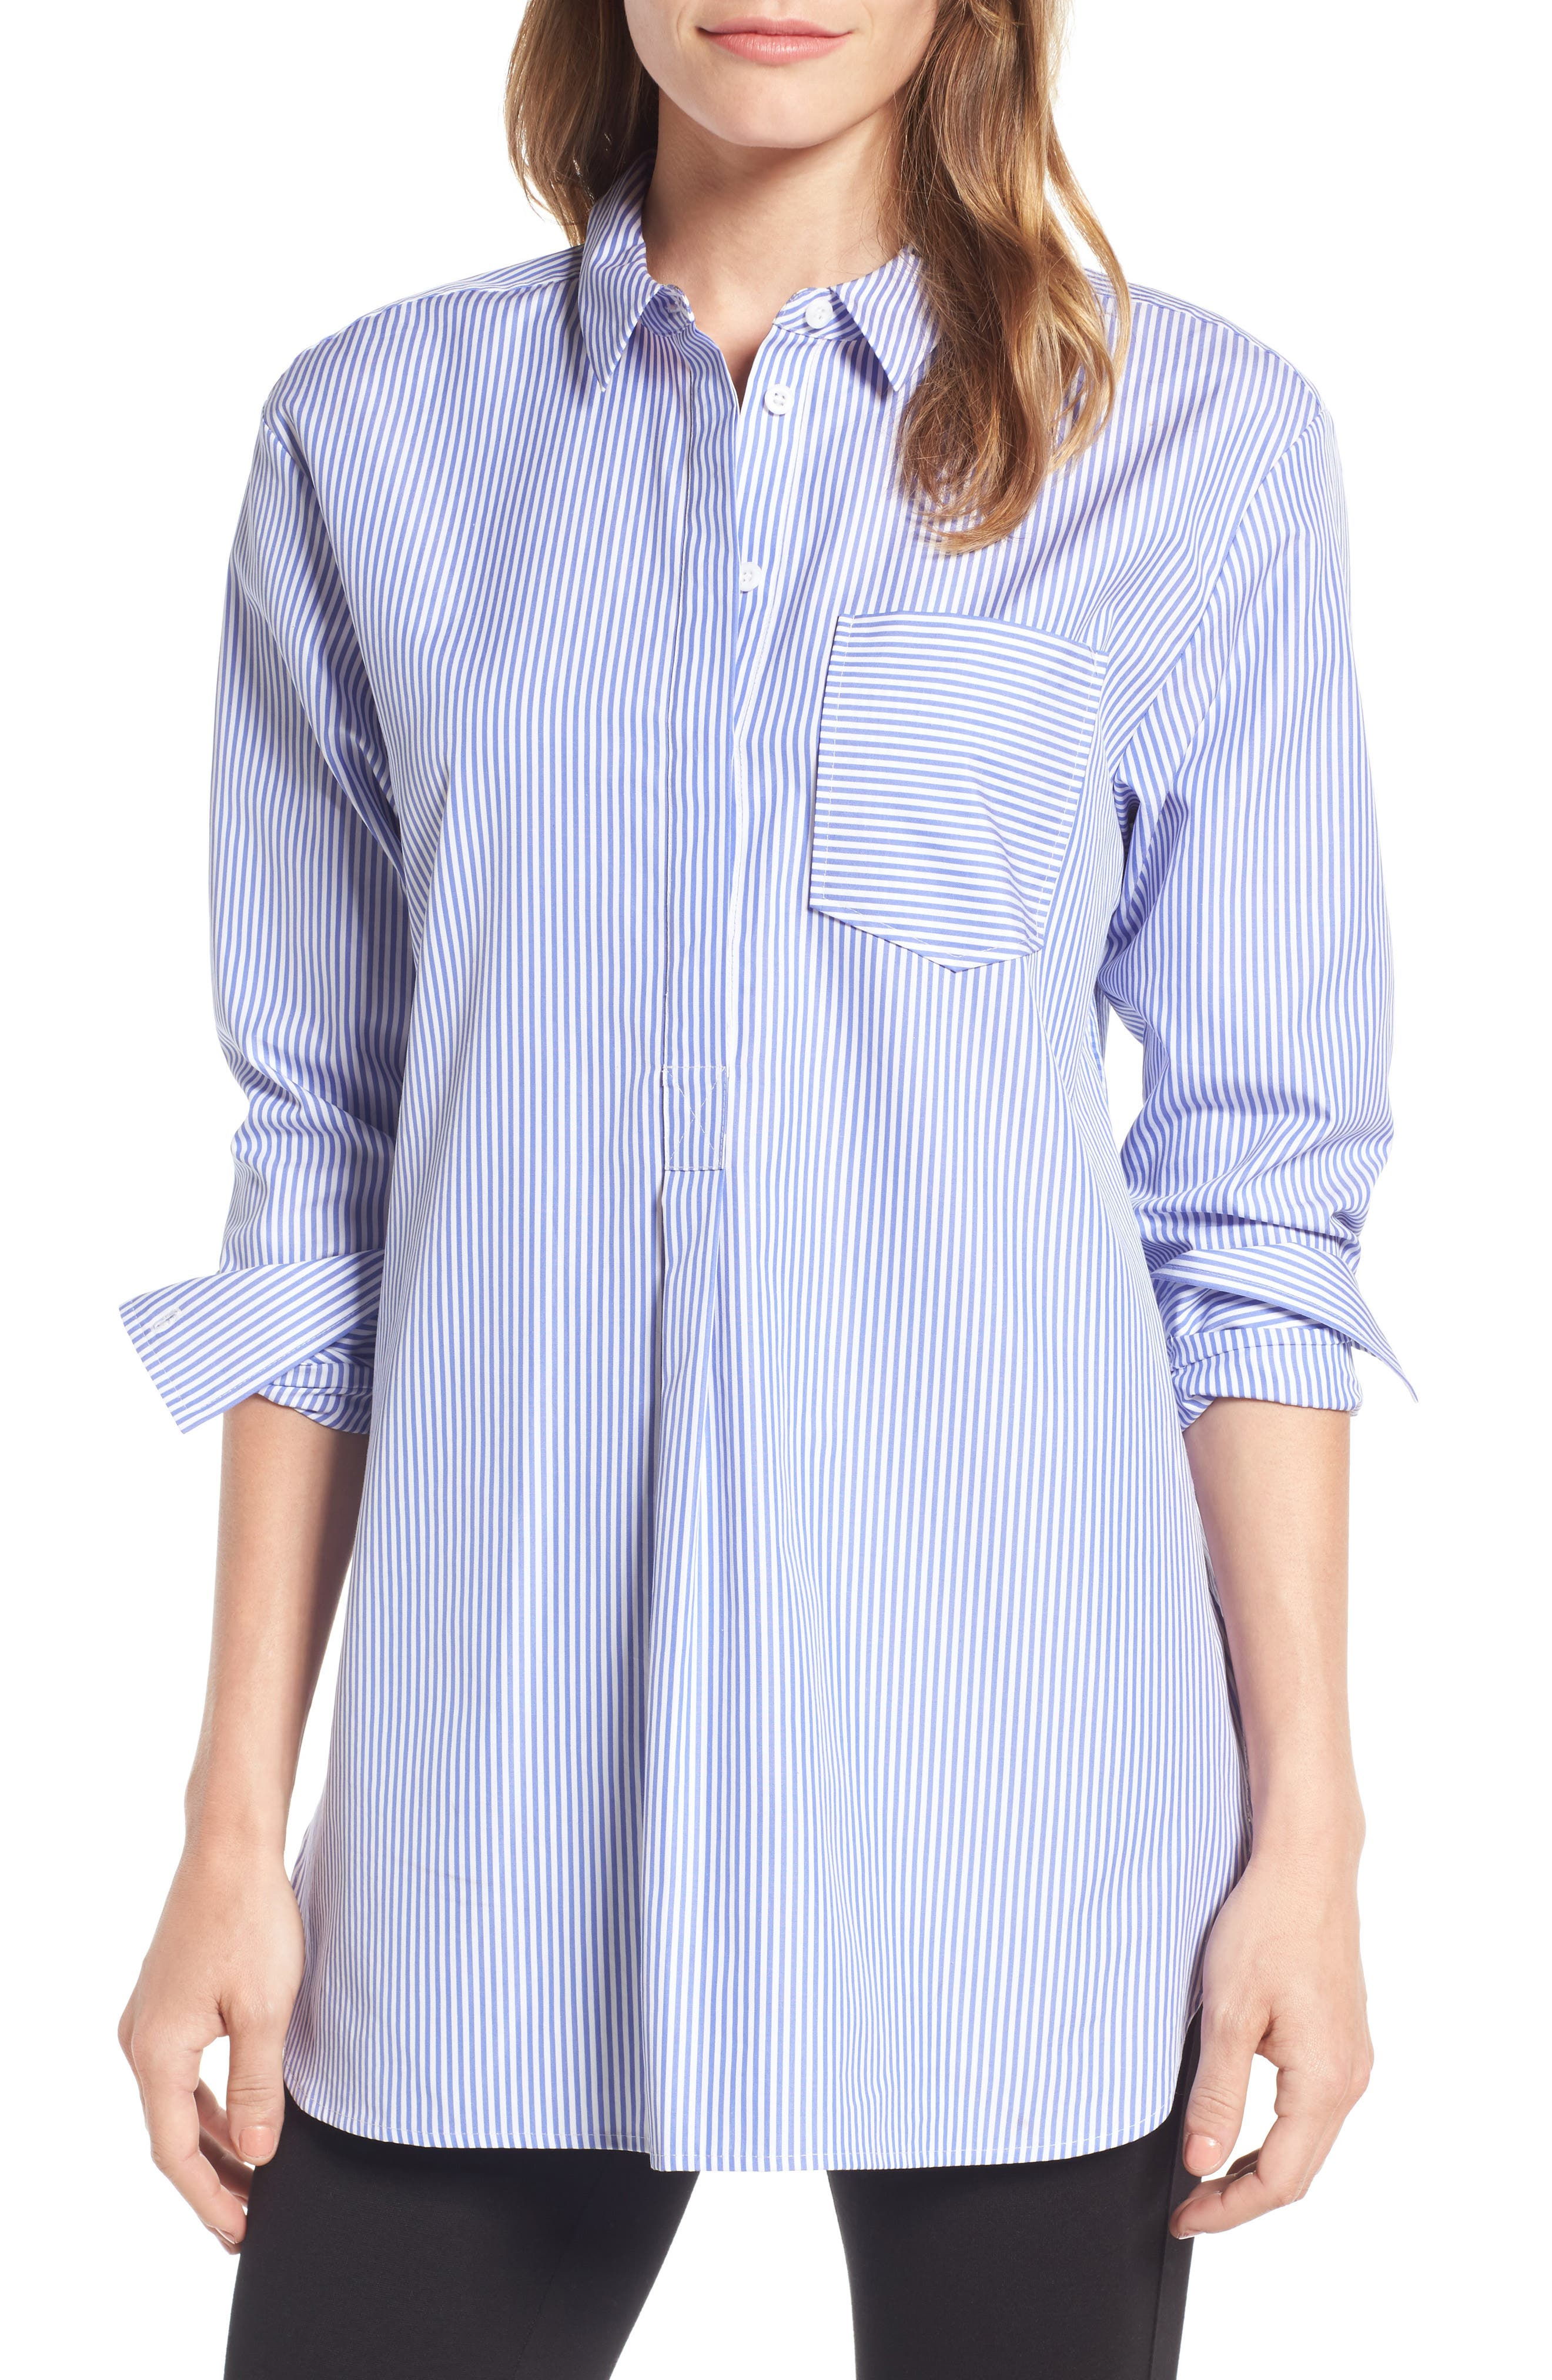 Nordstrom Signature Mixed Stripe Shirt